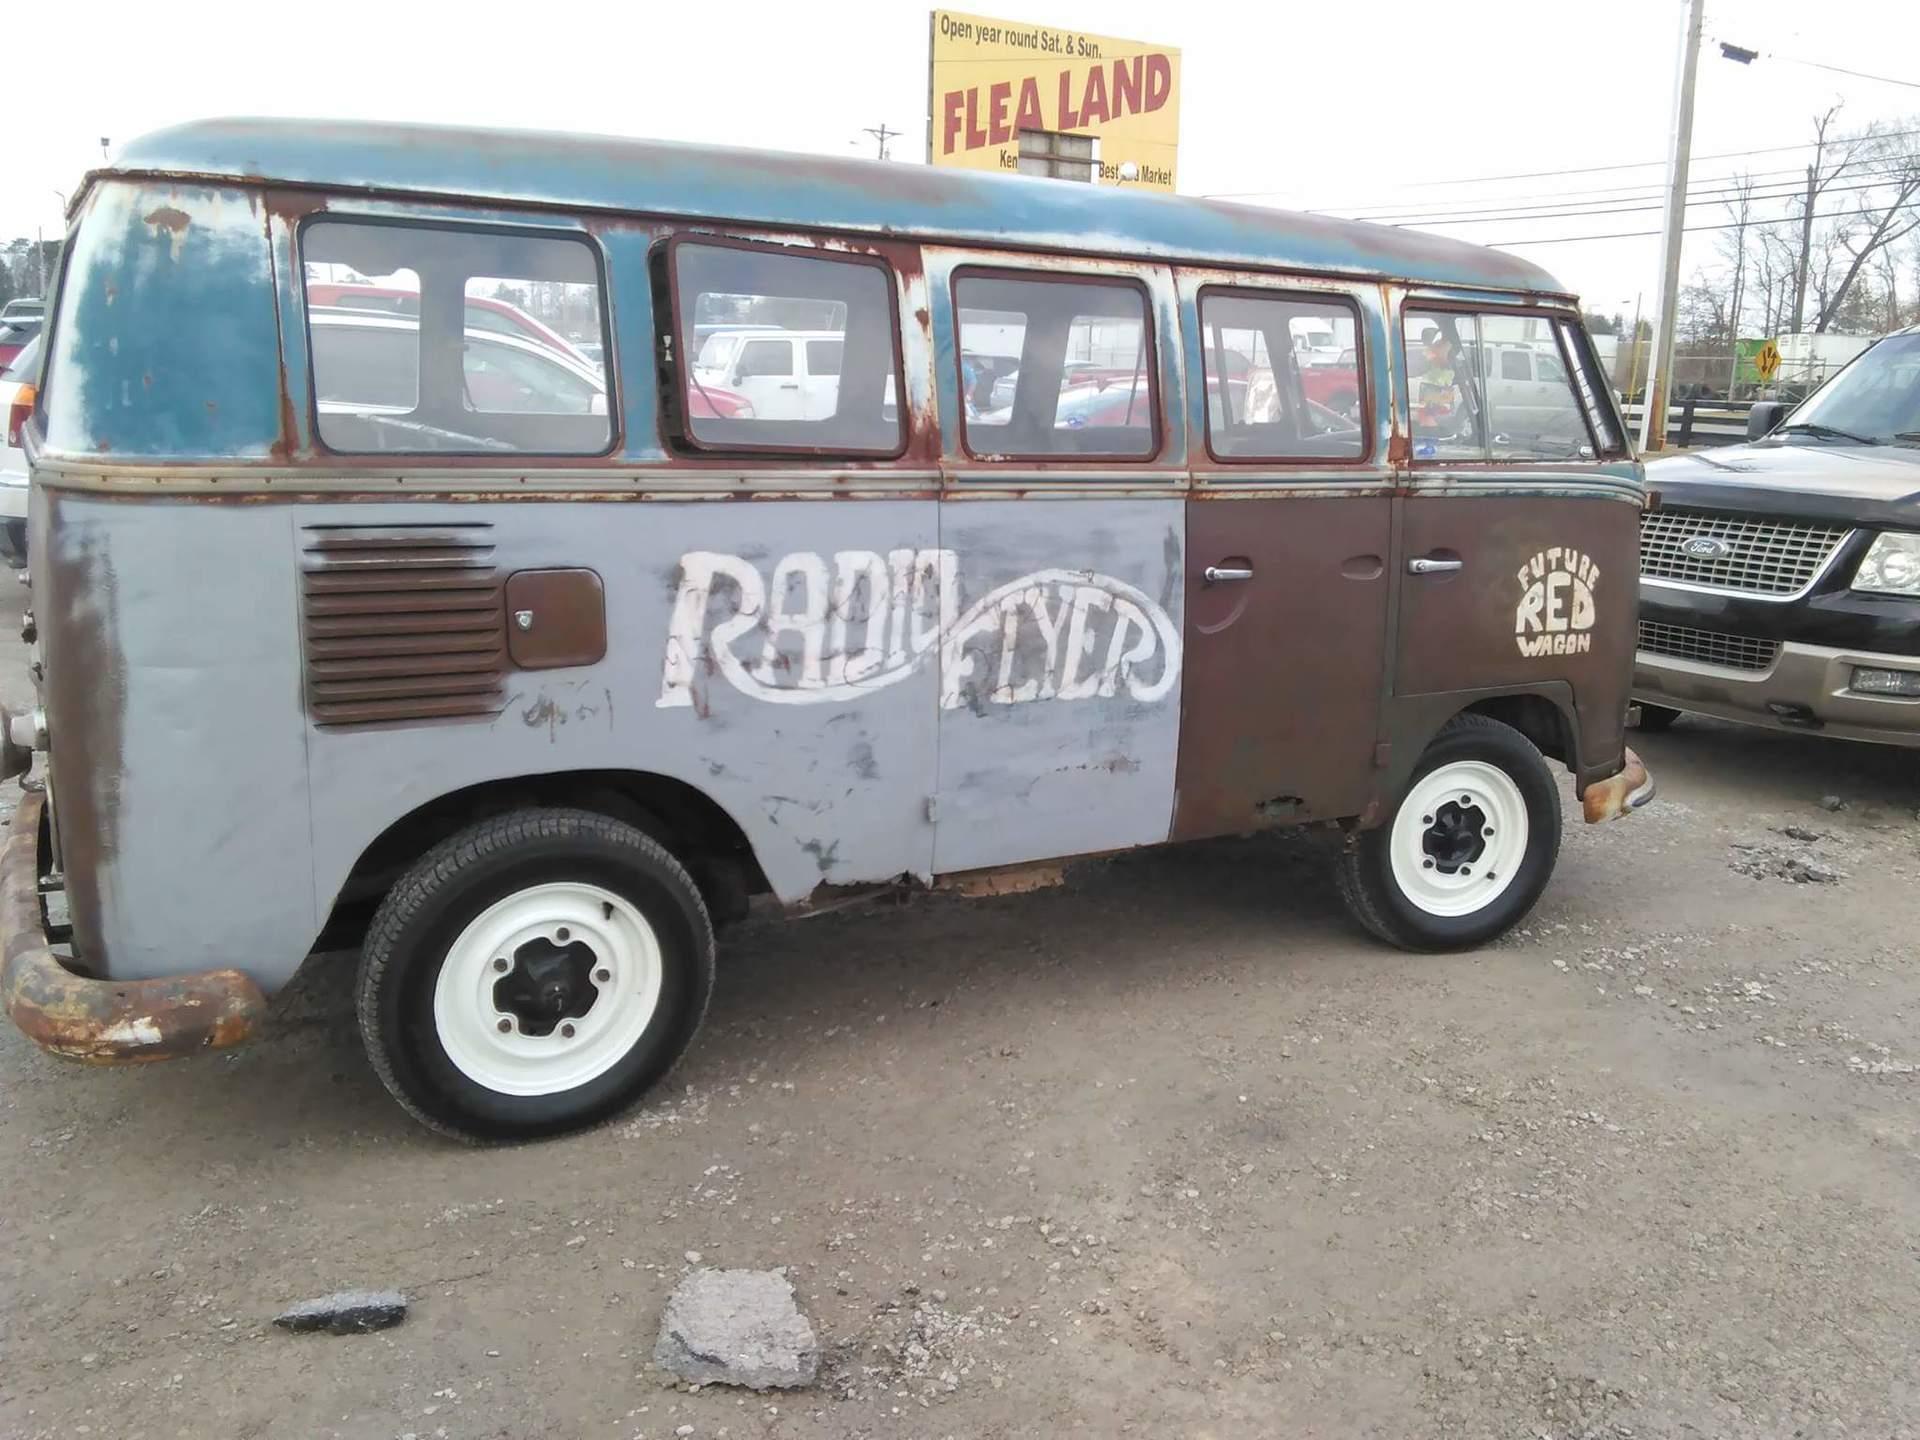 Old rusty bus | codenamesailorearth, automobile, auto, transportation